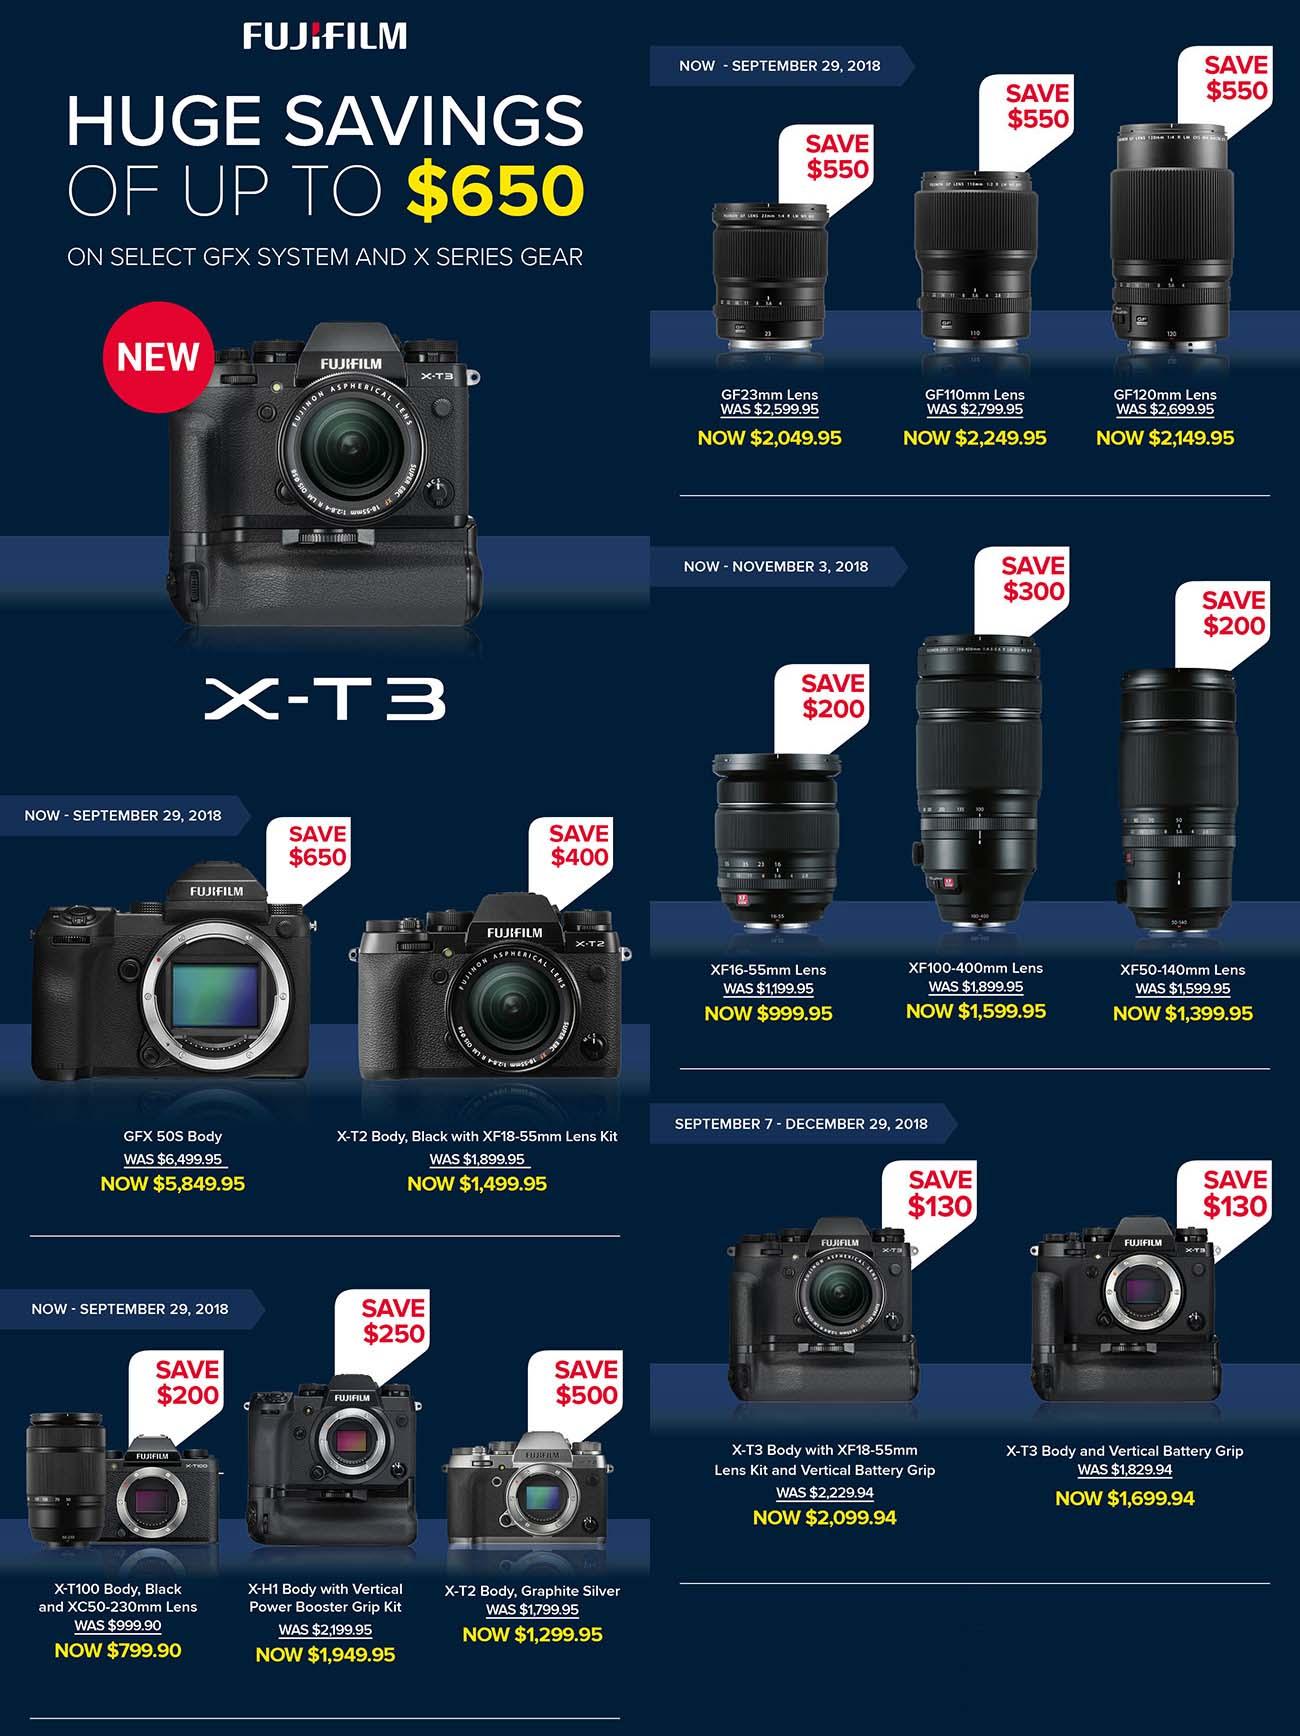 Fujifilm Savings Sunday With X T3 Fuji Addict E3 Kit Xf 23mm F2 Black 35mm T3w Grip Save 130 Bh Photo Amazon Adorama 18 55mm W